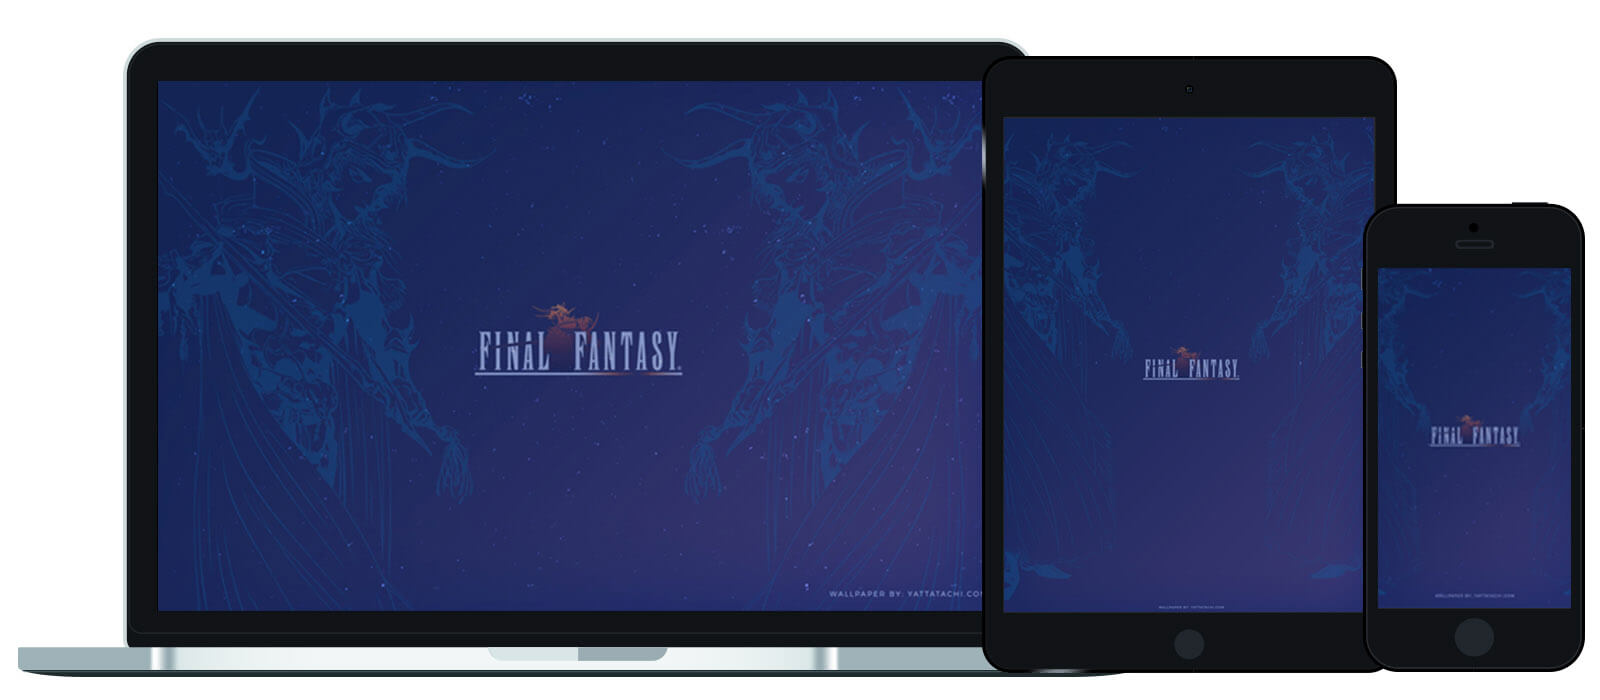 Yatta-Tachi's Wallpaper of the Month - Final Fantasy 1